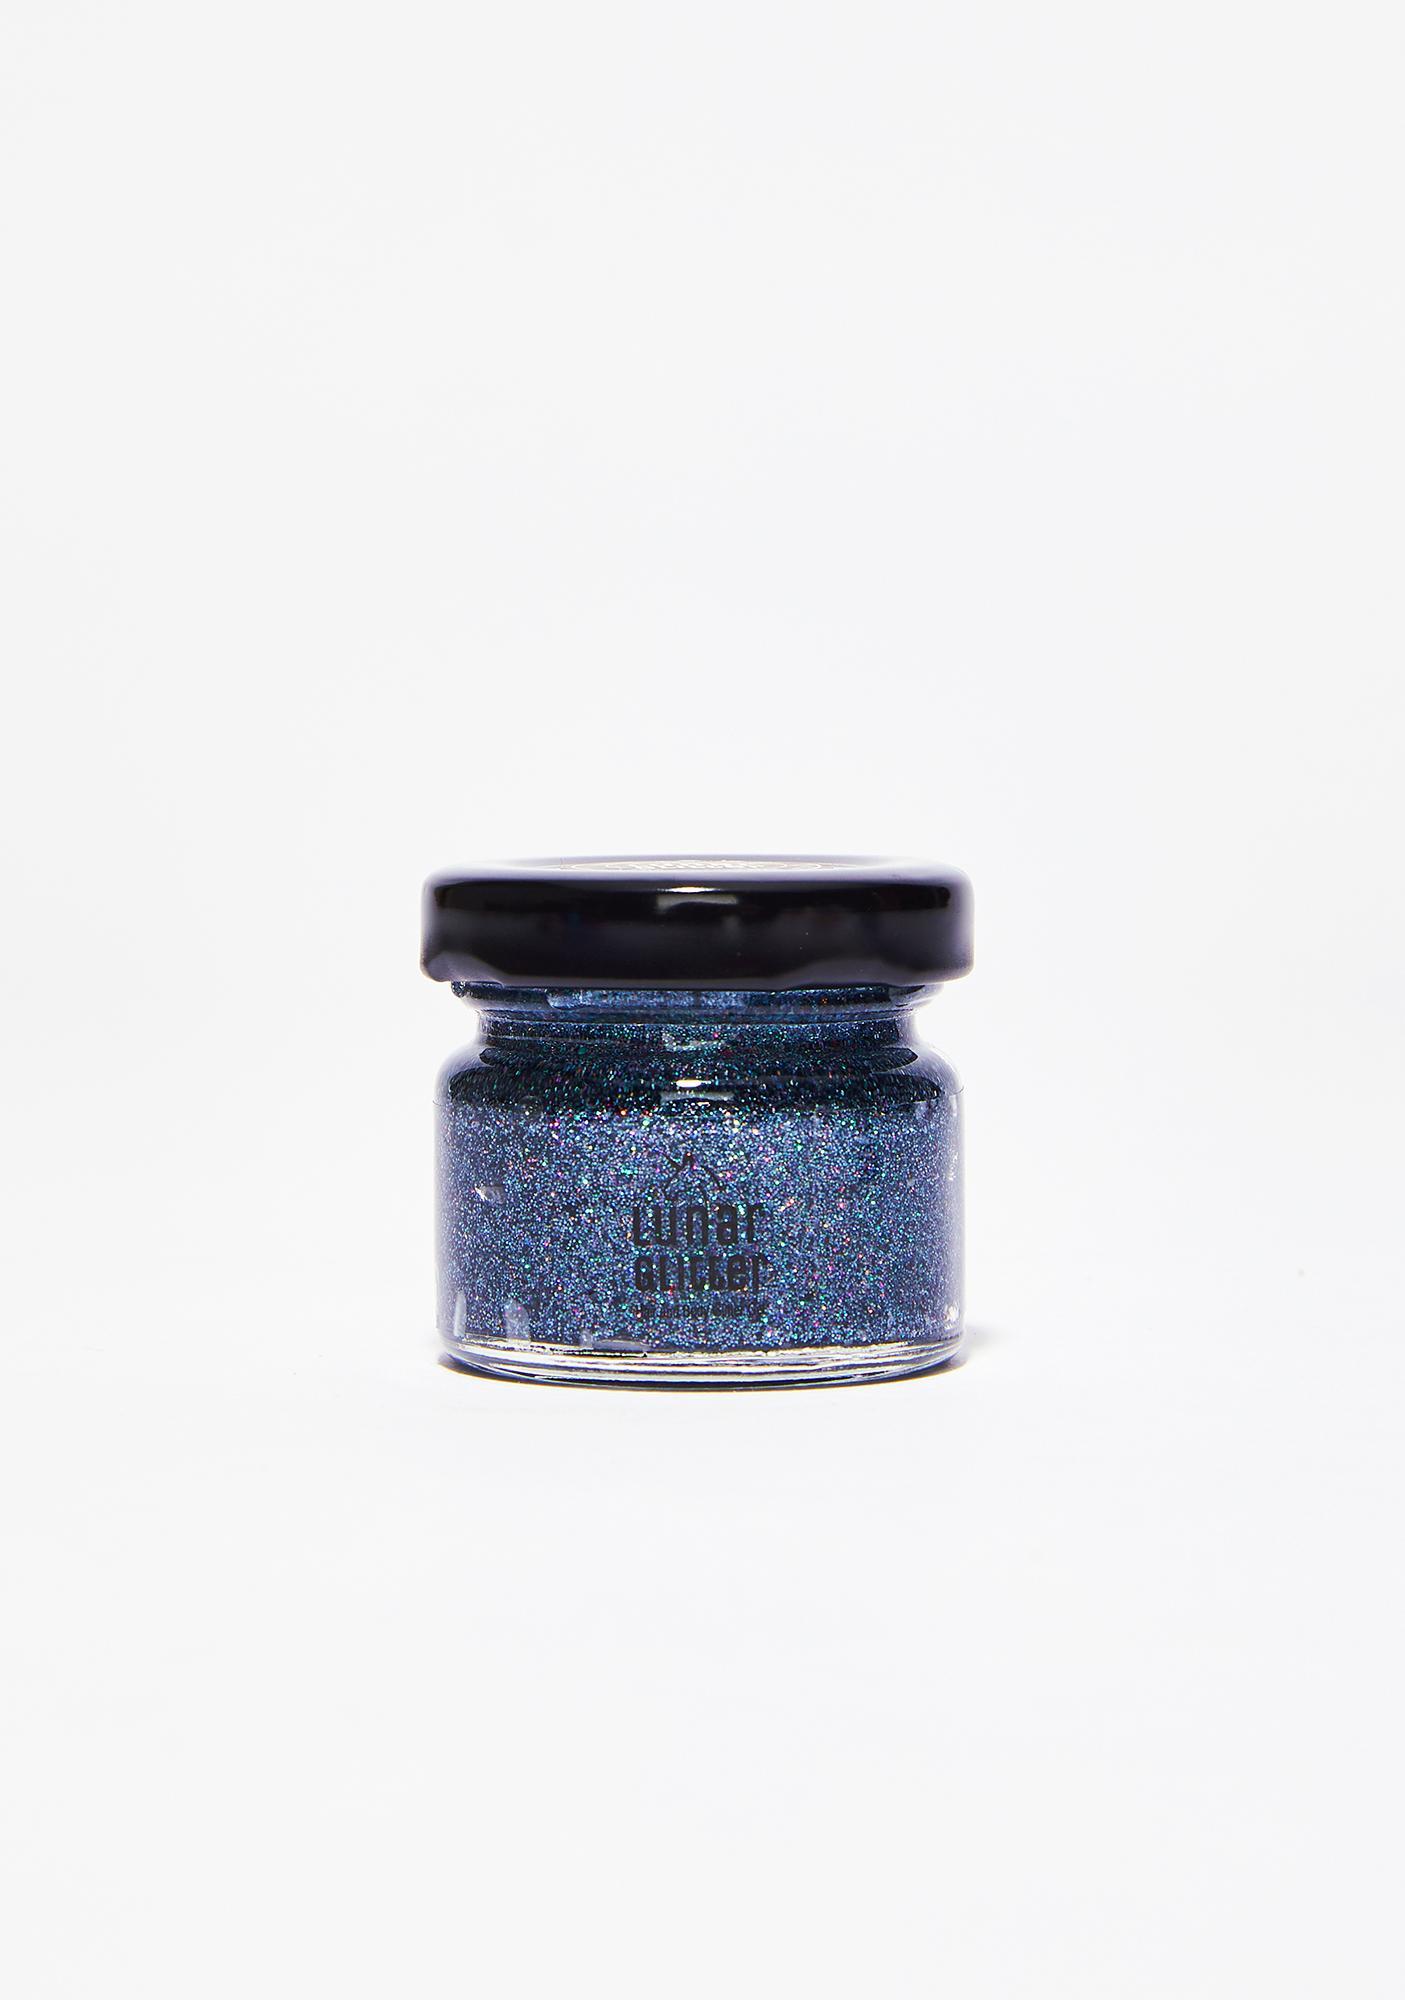 Lunar Glitter Meltdown Glitter Gel